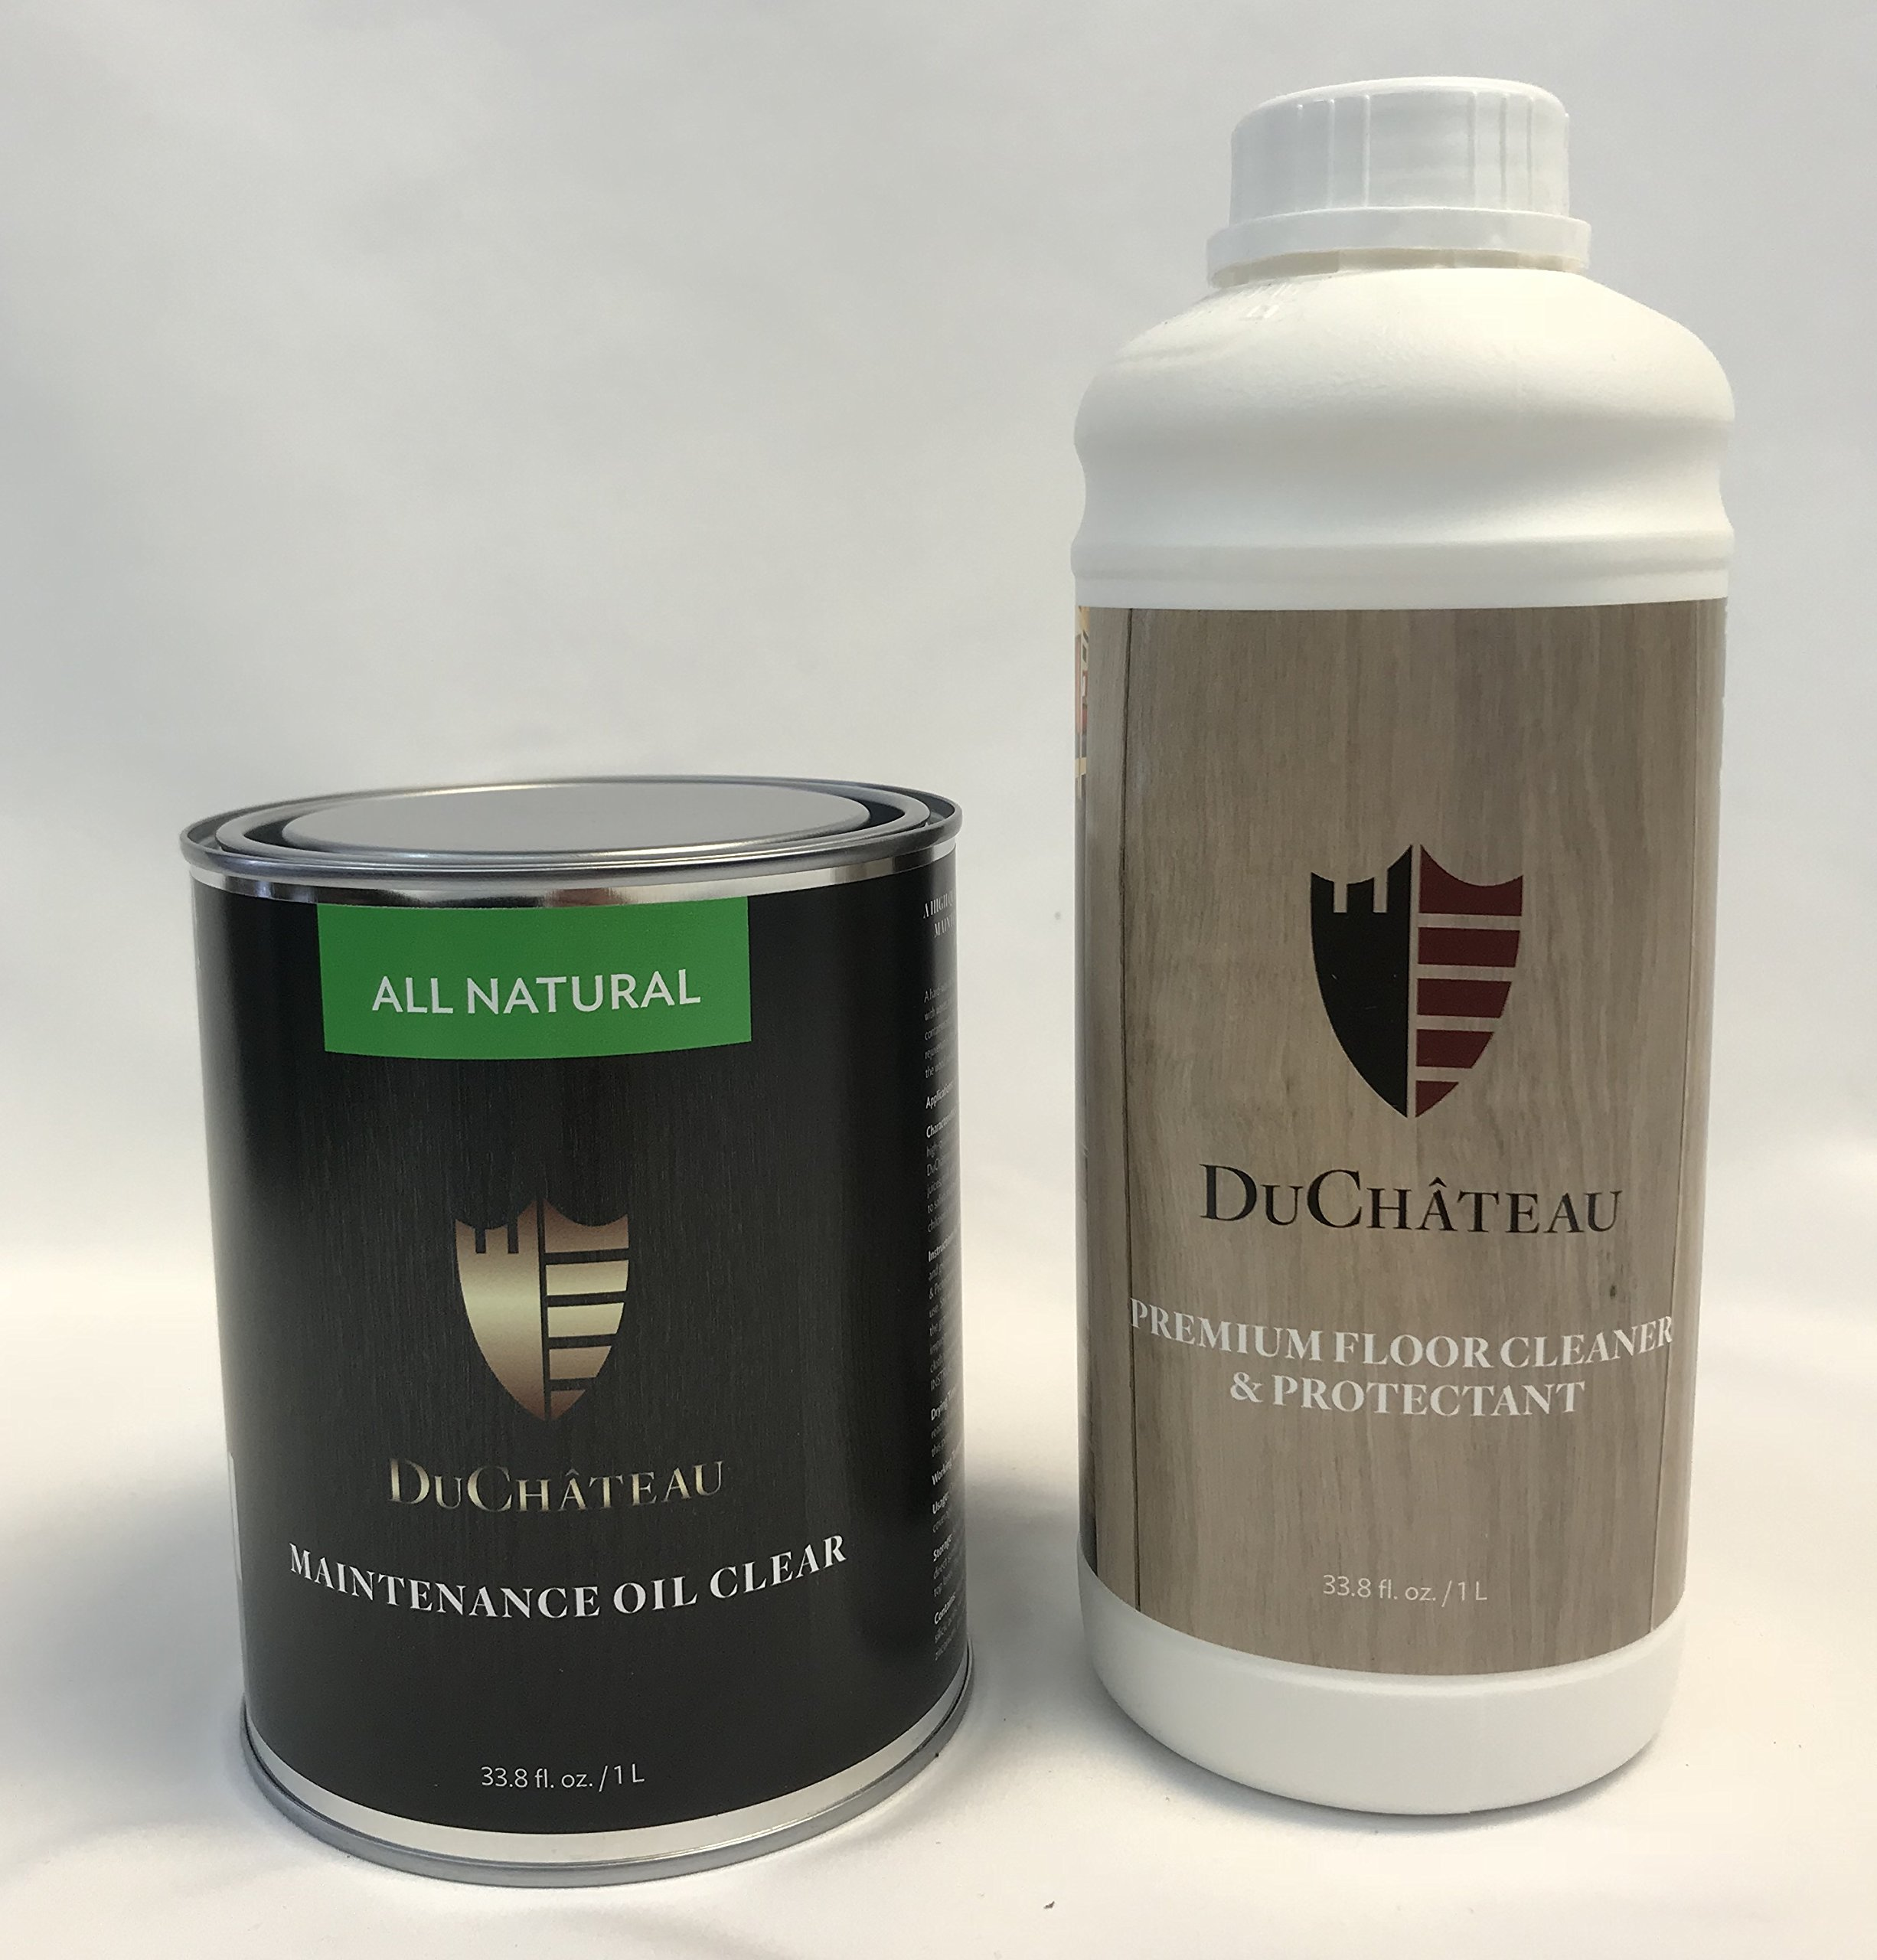 DuChateau Combo Pak DuChateau Floors 33.8 fl oz Premium Floor Cleaner & Protectant 1 Liter and 33.8 fl oz Floors Maintenance Oil, Clear 1 Liter